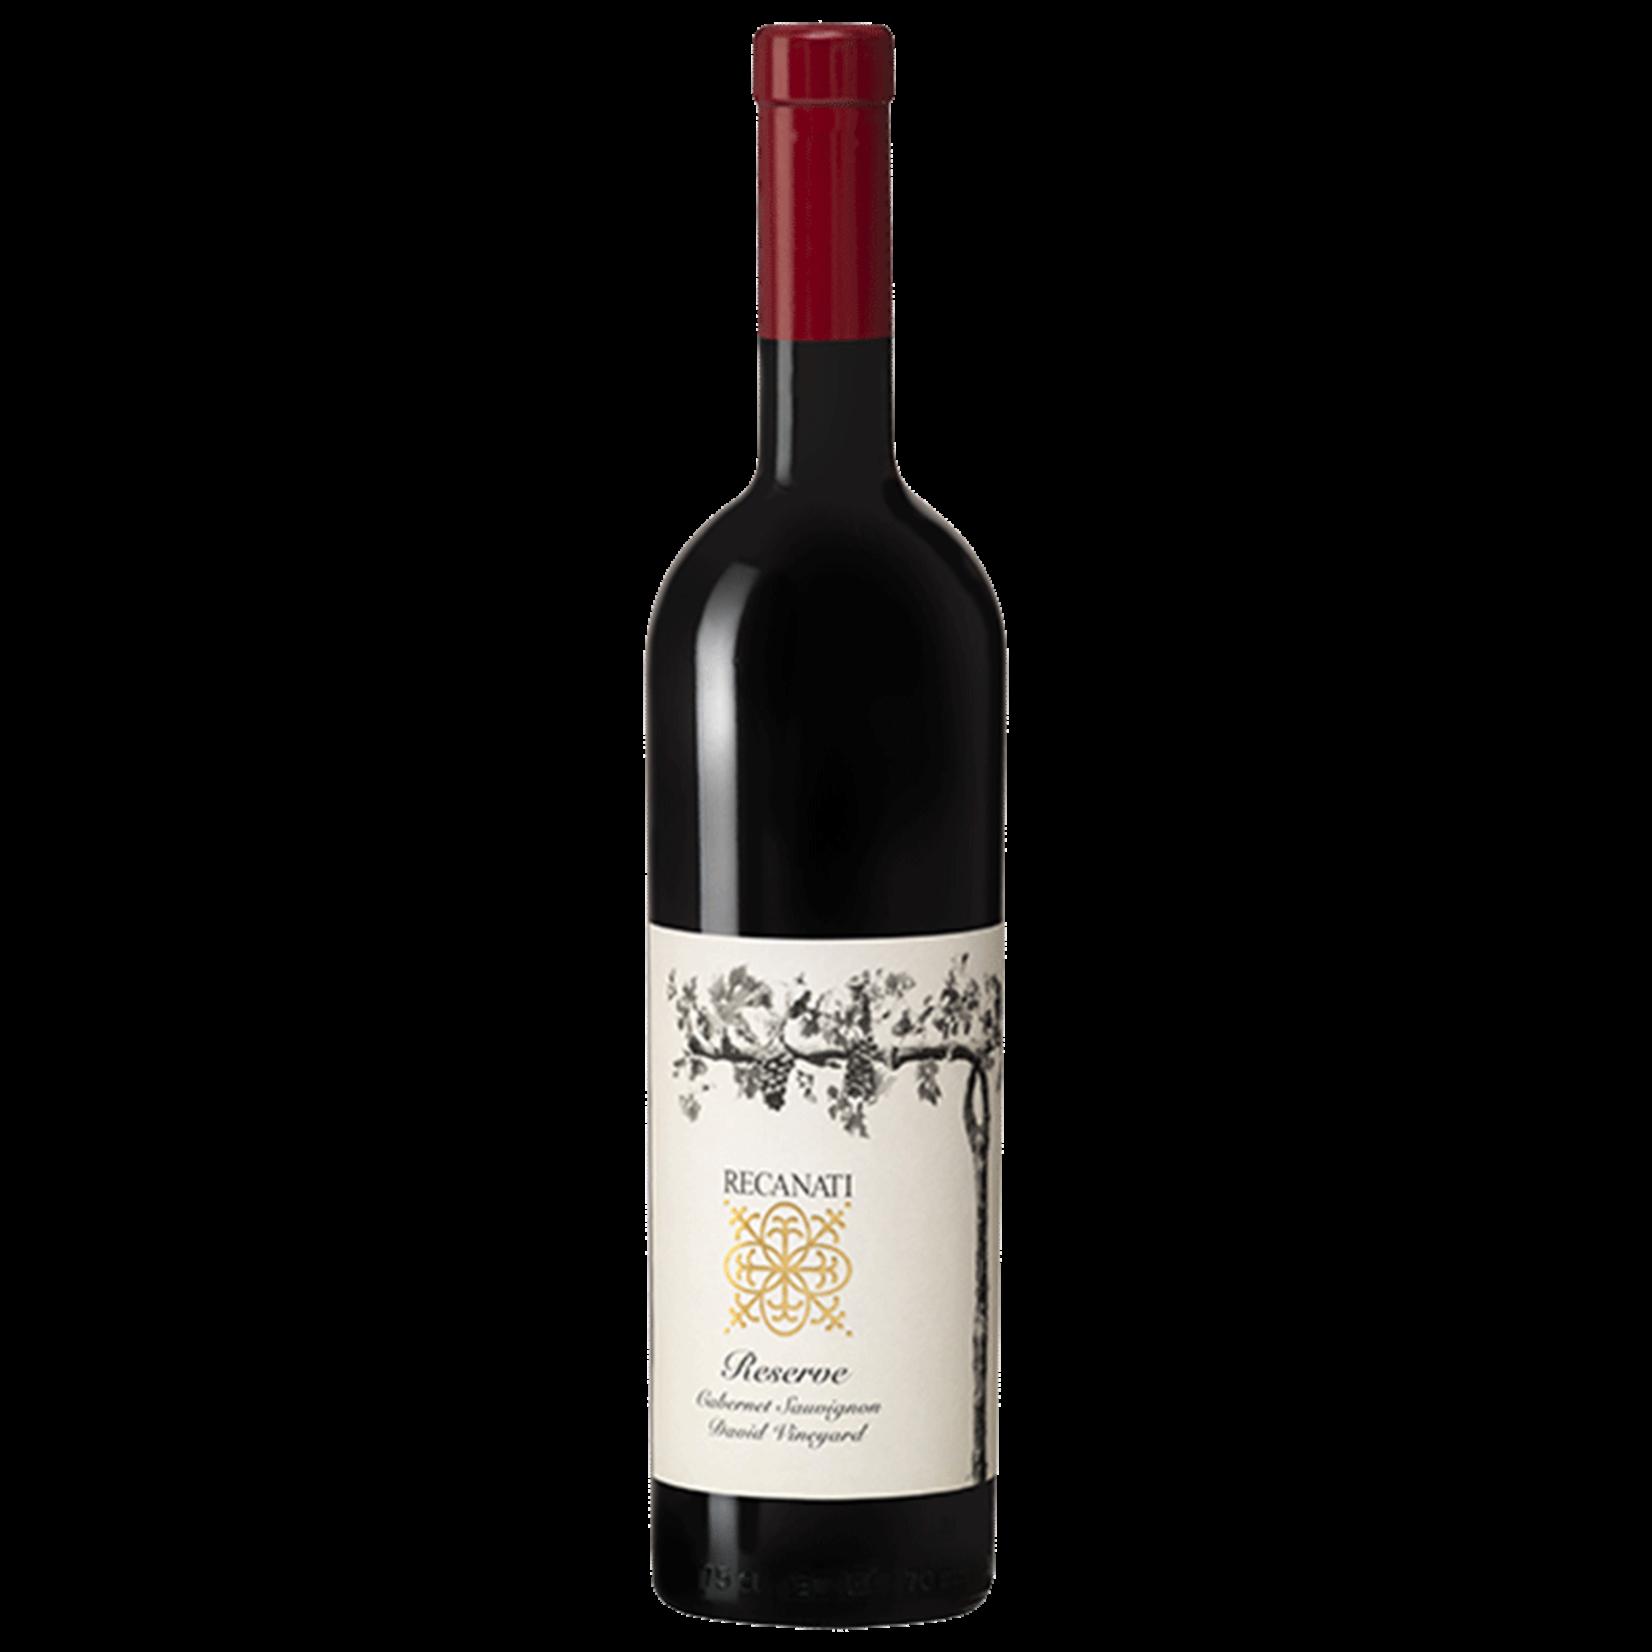 Wine Recanati Cabernet Sauvignon Reserve David Vineyard 2016 Kosher